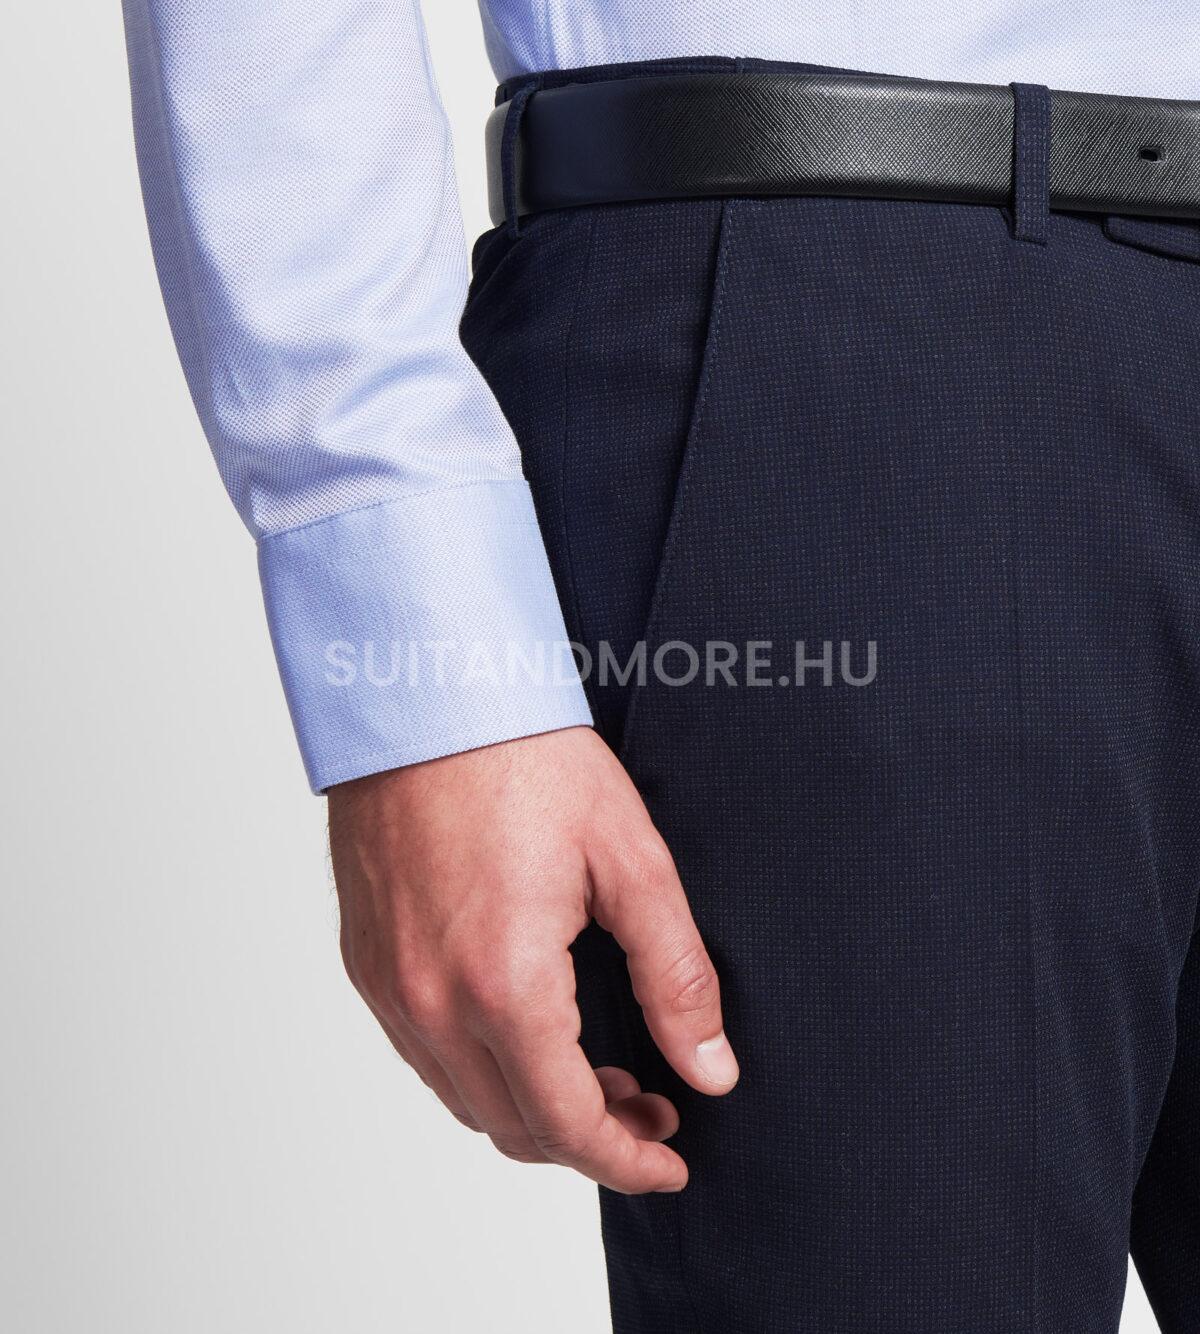 digel-move-kek-extra-slim-fit-szovetnadrag-nico-1281700-20